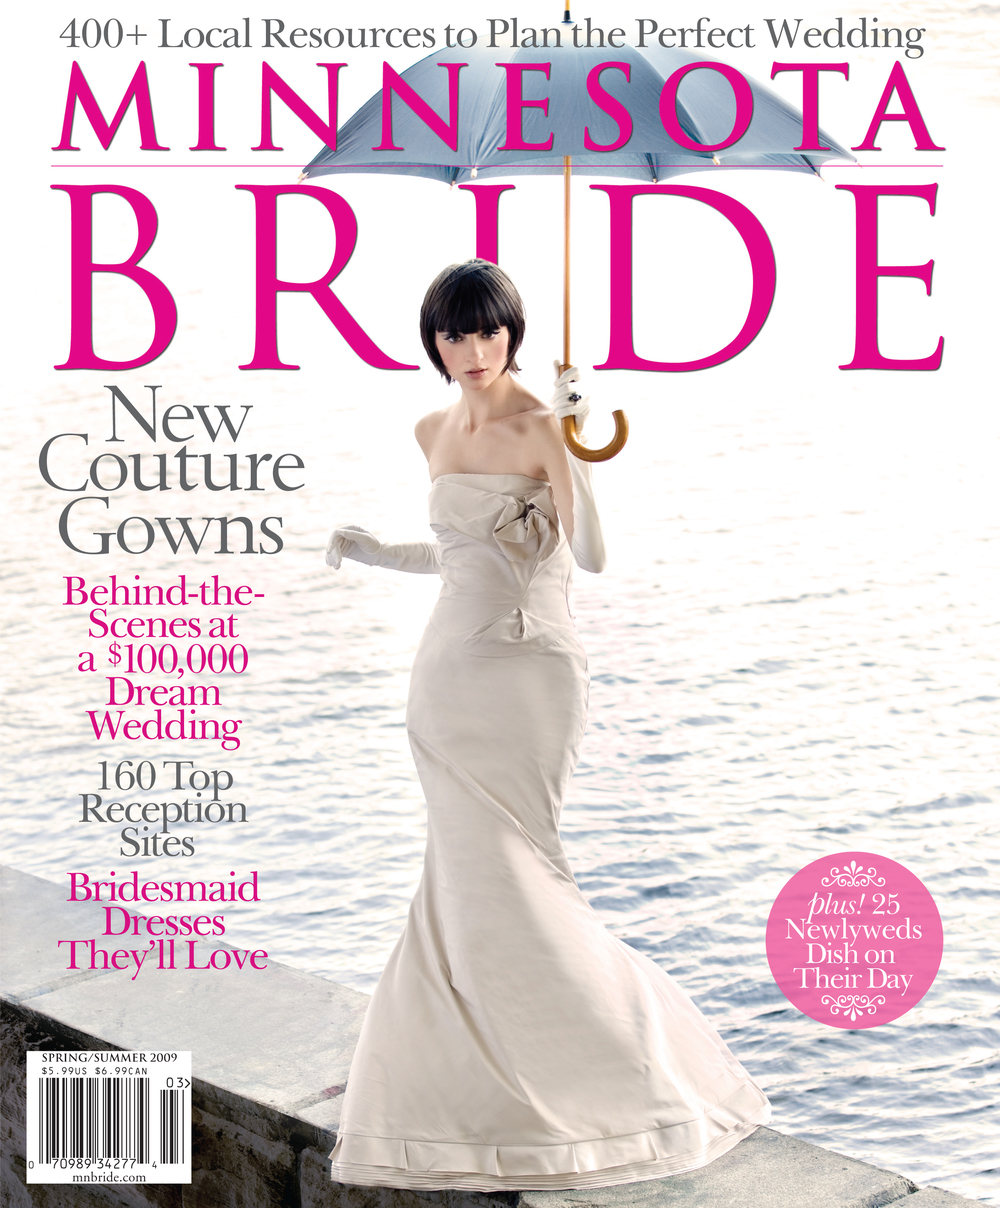 Minnesota Bride, Spring 2009